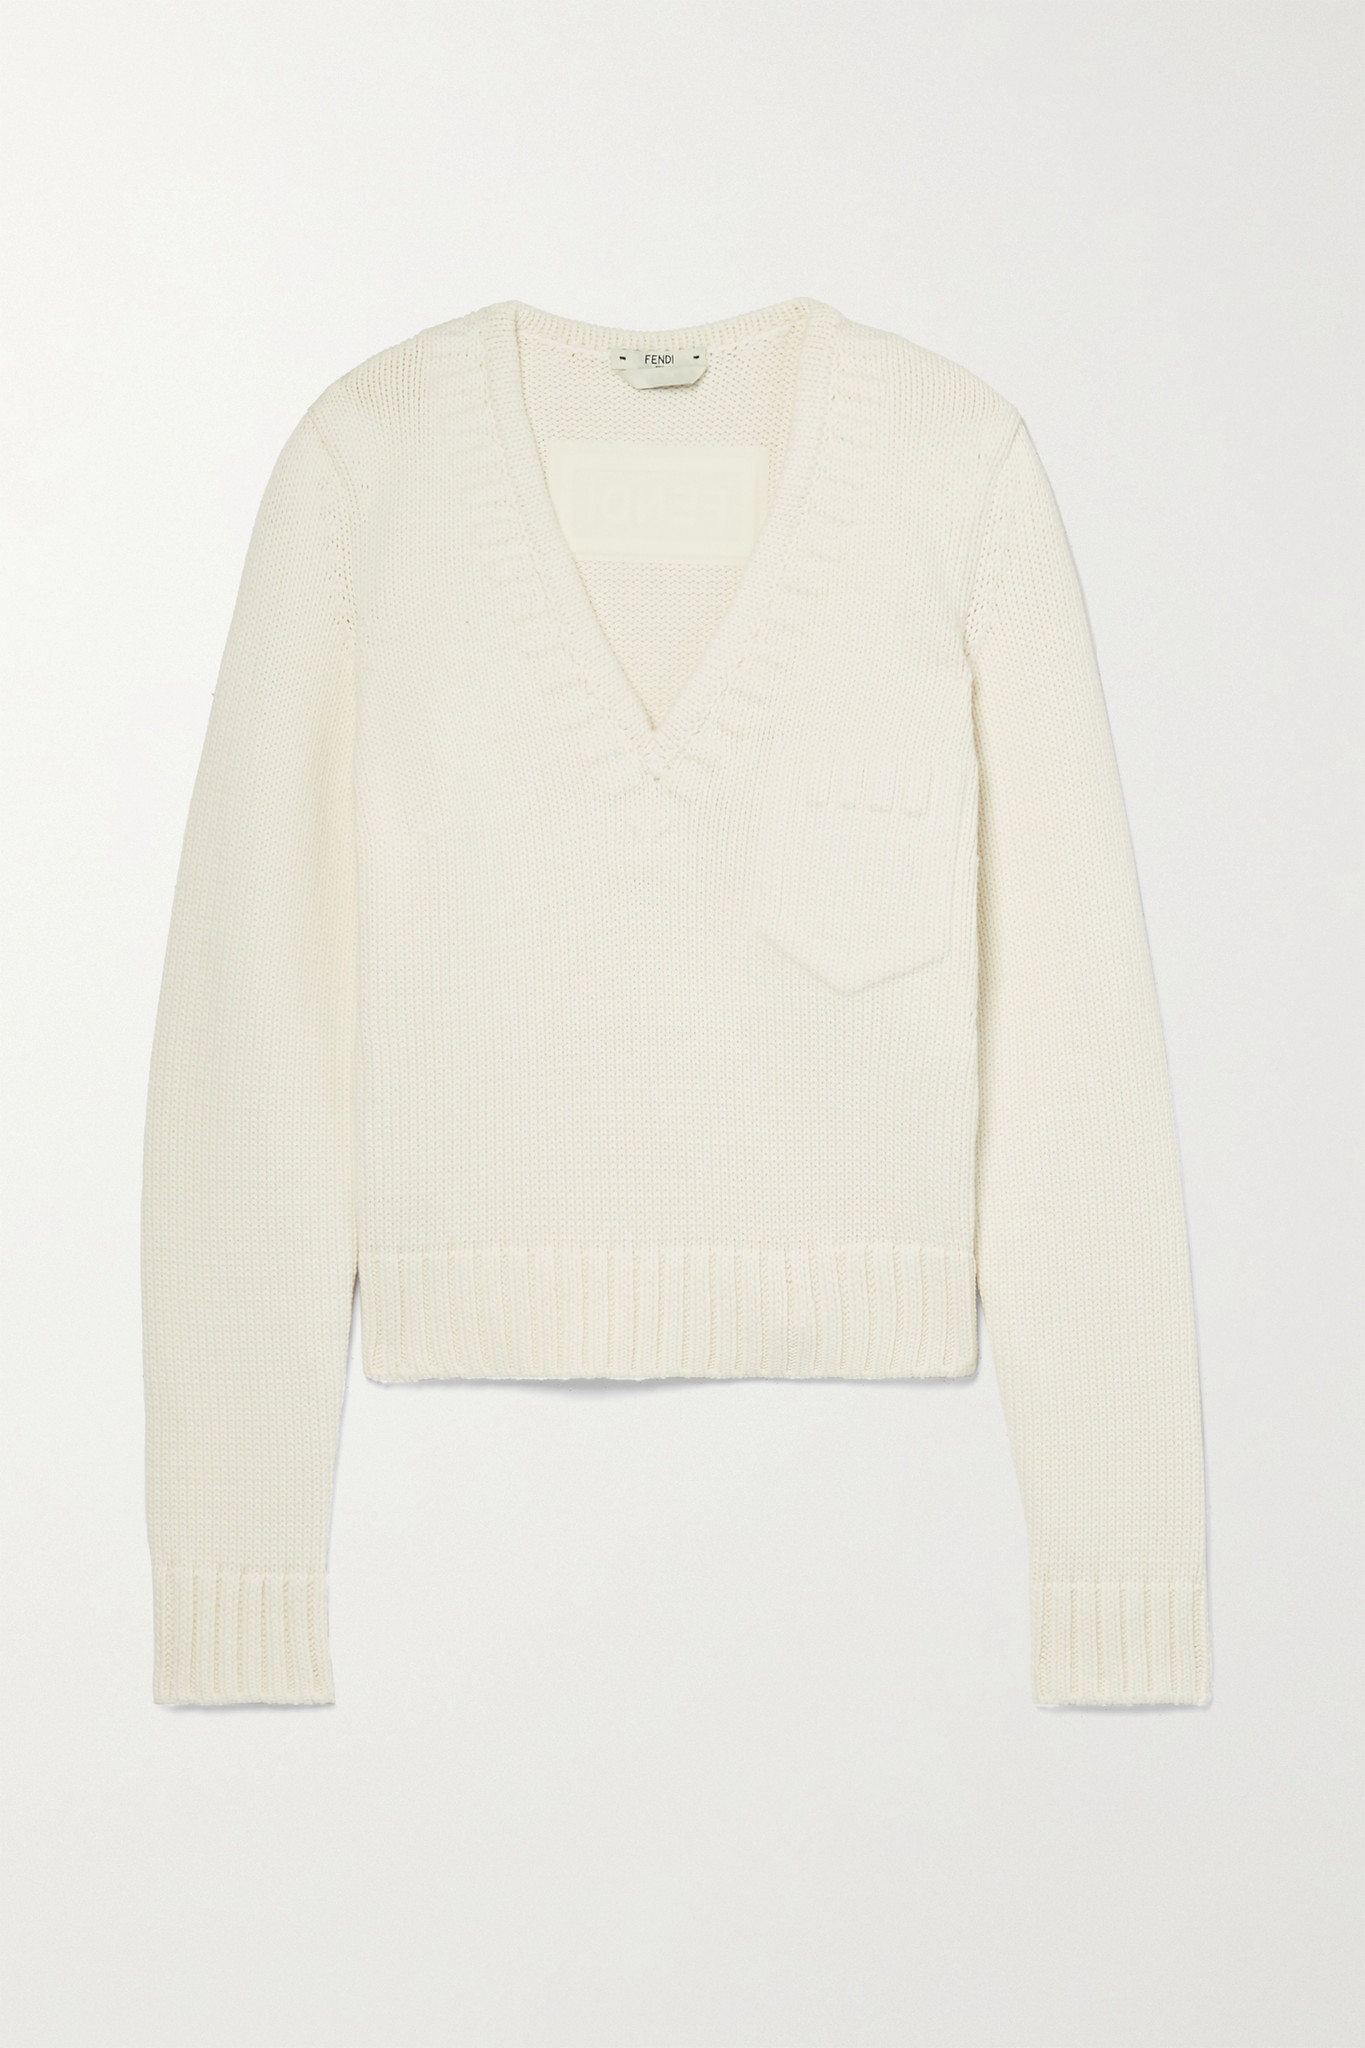 FENDI - Cropped Cotton-blend Sweater - Off-white - IT42